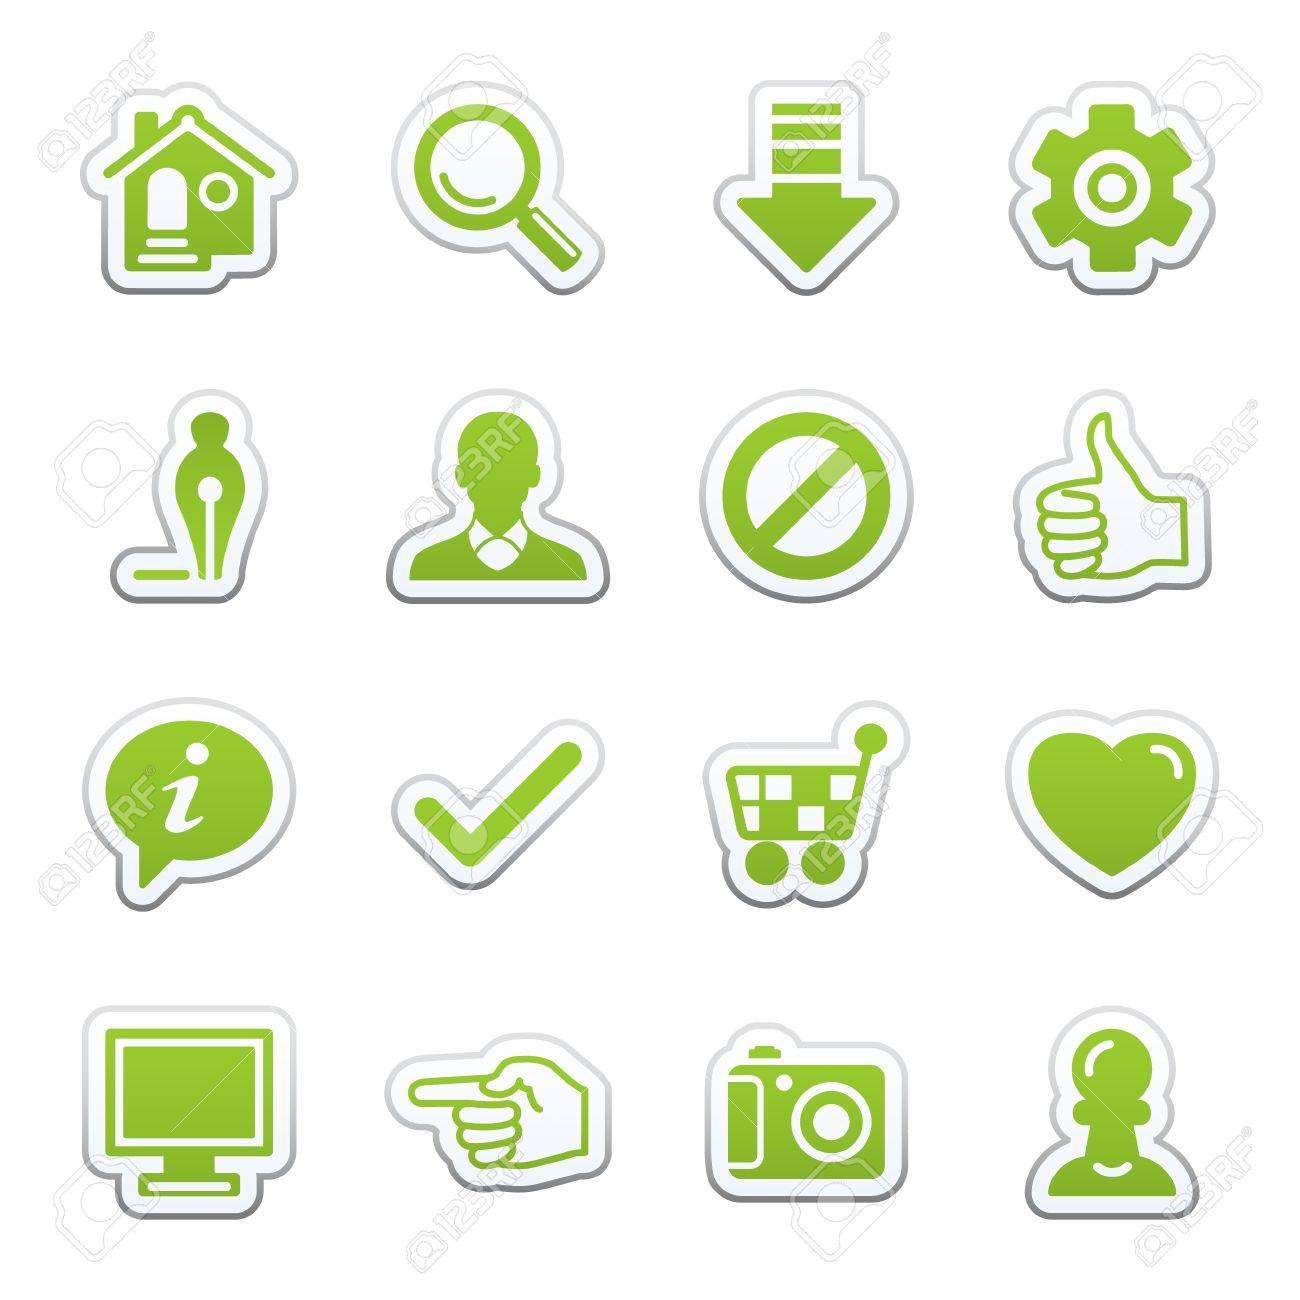 Basic web icons. Stock Vector - 9340372